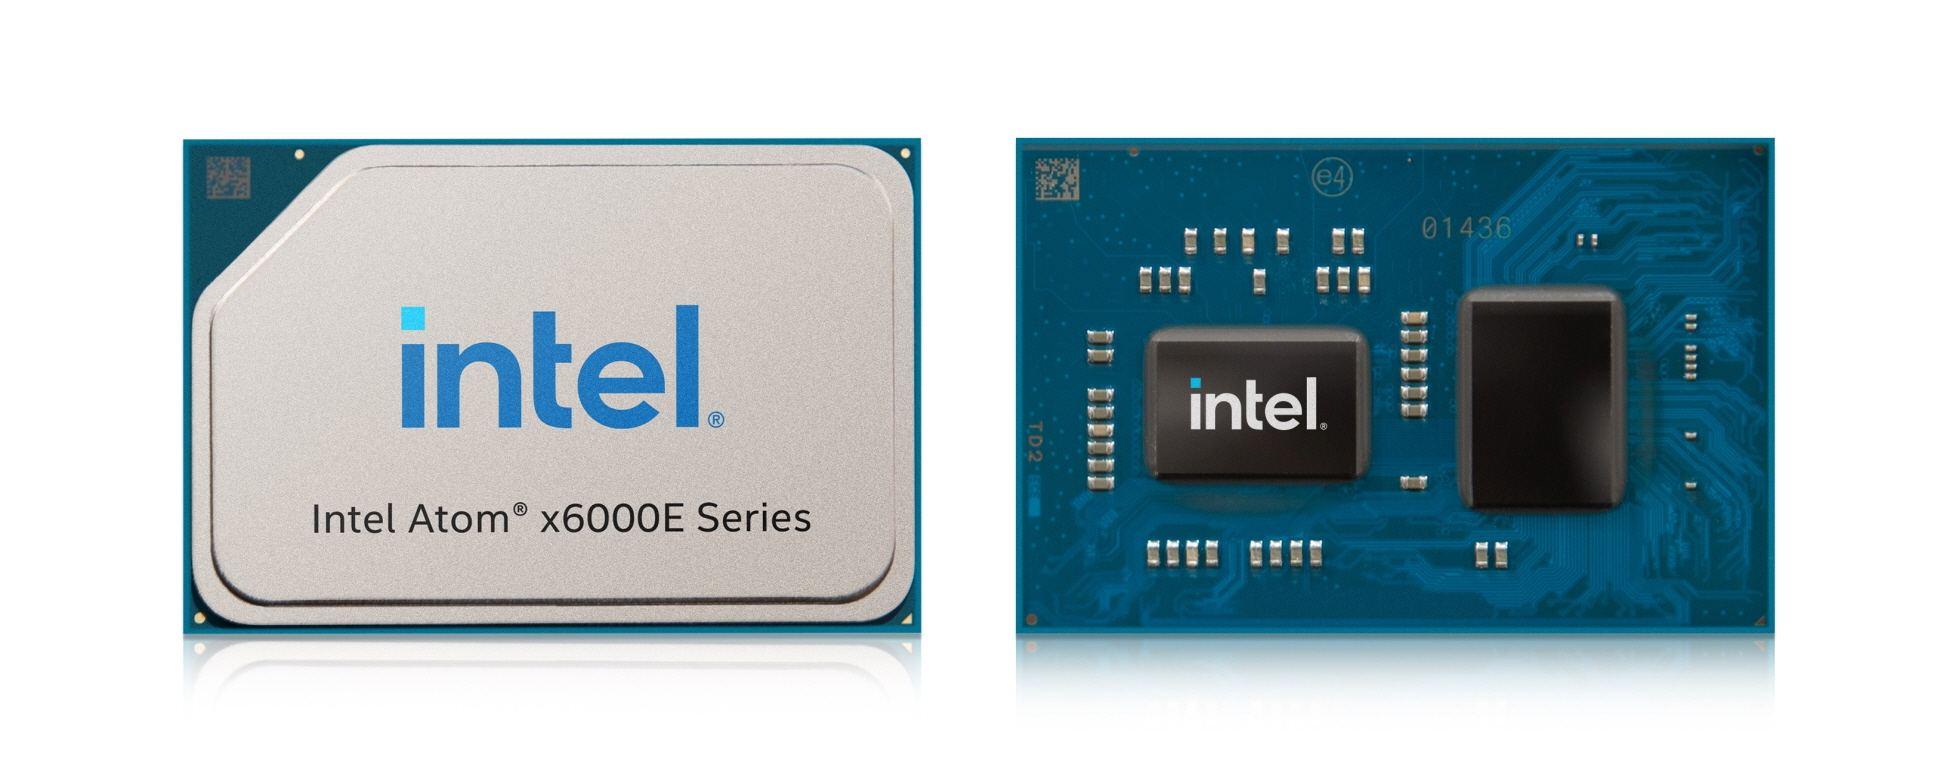 200924_Intel Industrial Summit_Contents (2)